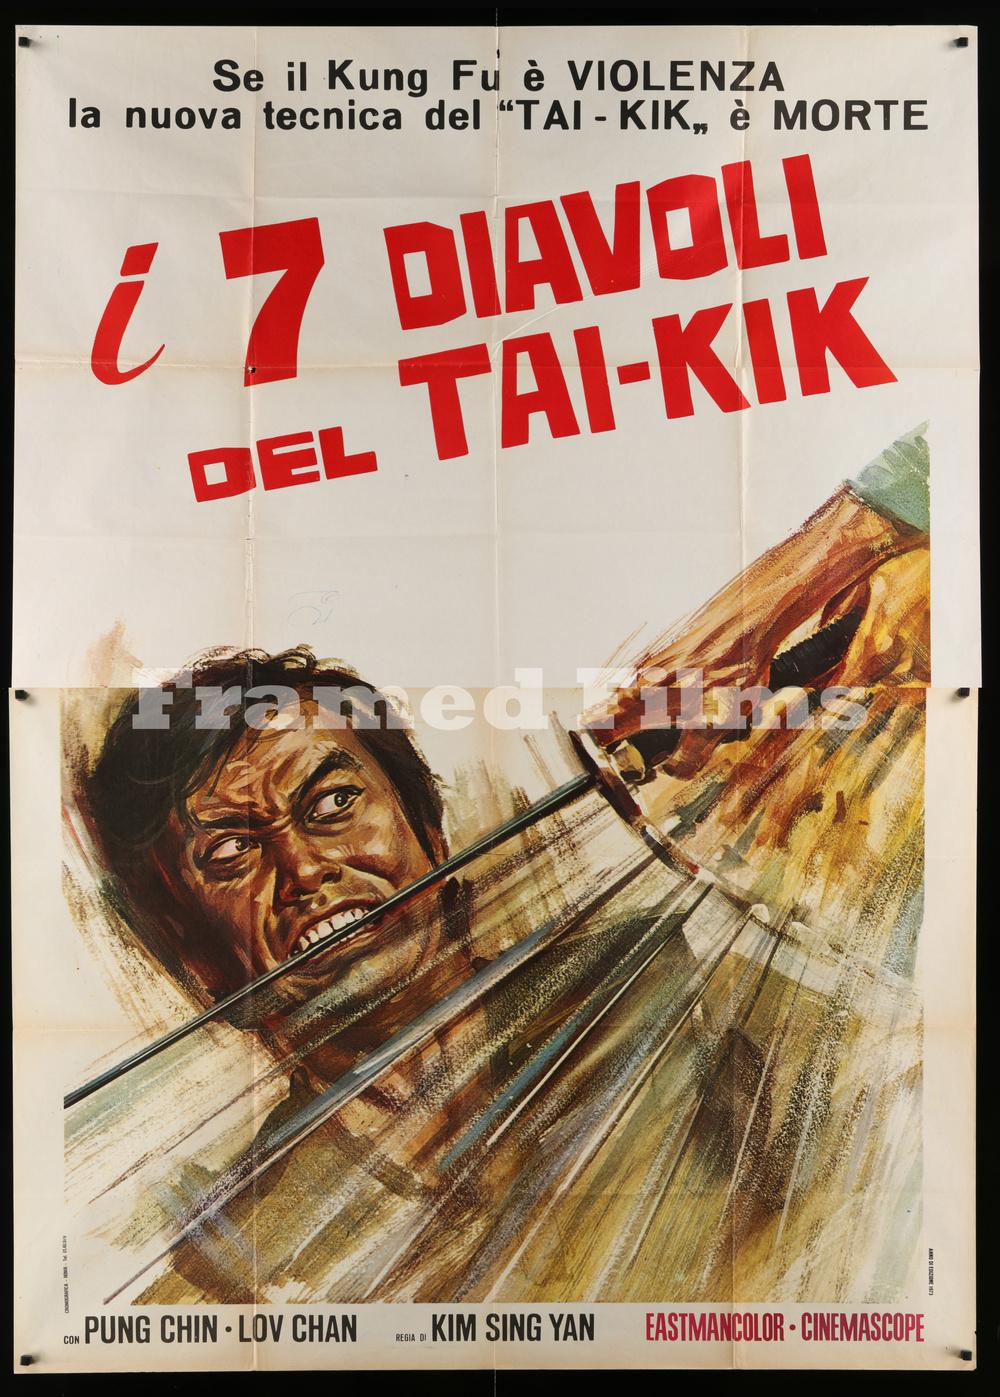 italian_2p_i_7_diavoli_del_tai_kik_SD04424_T.jpg